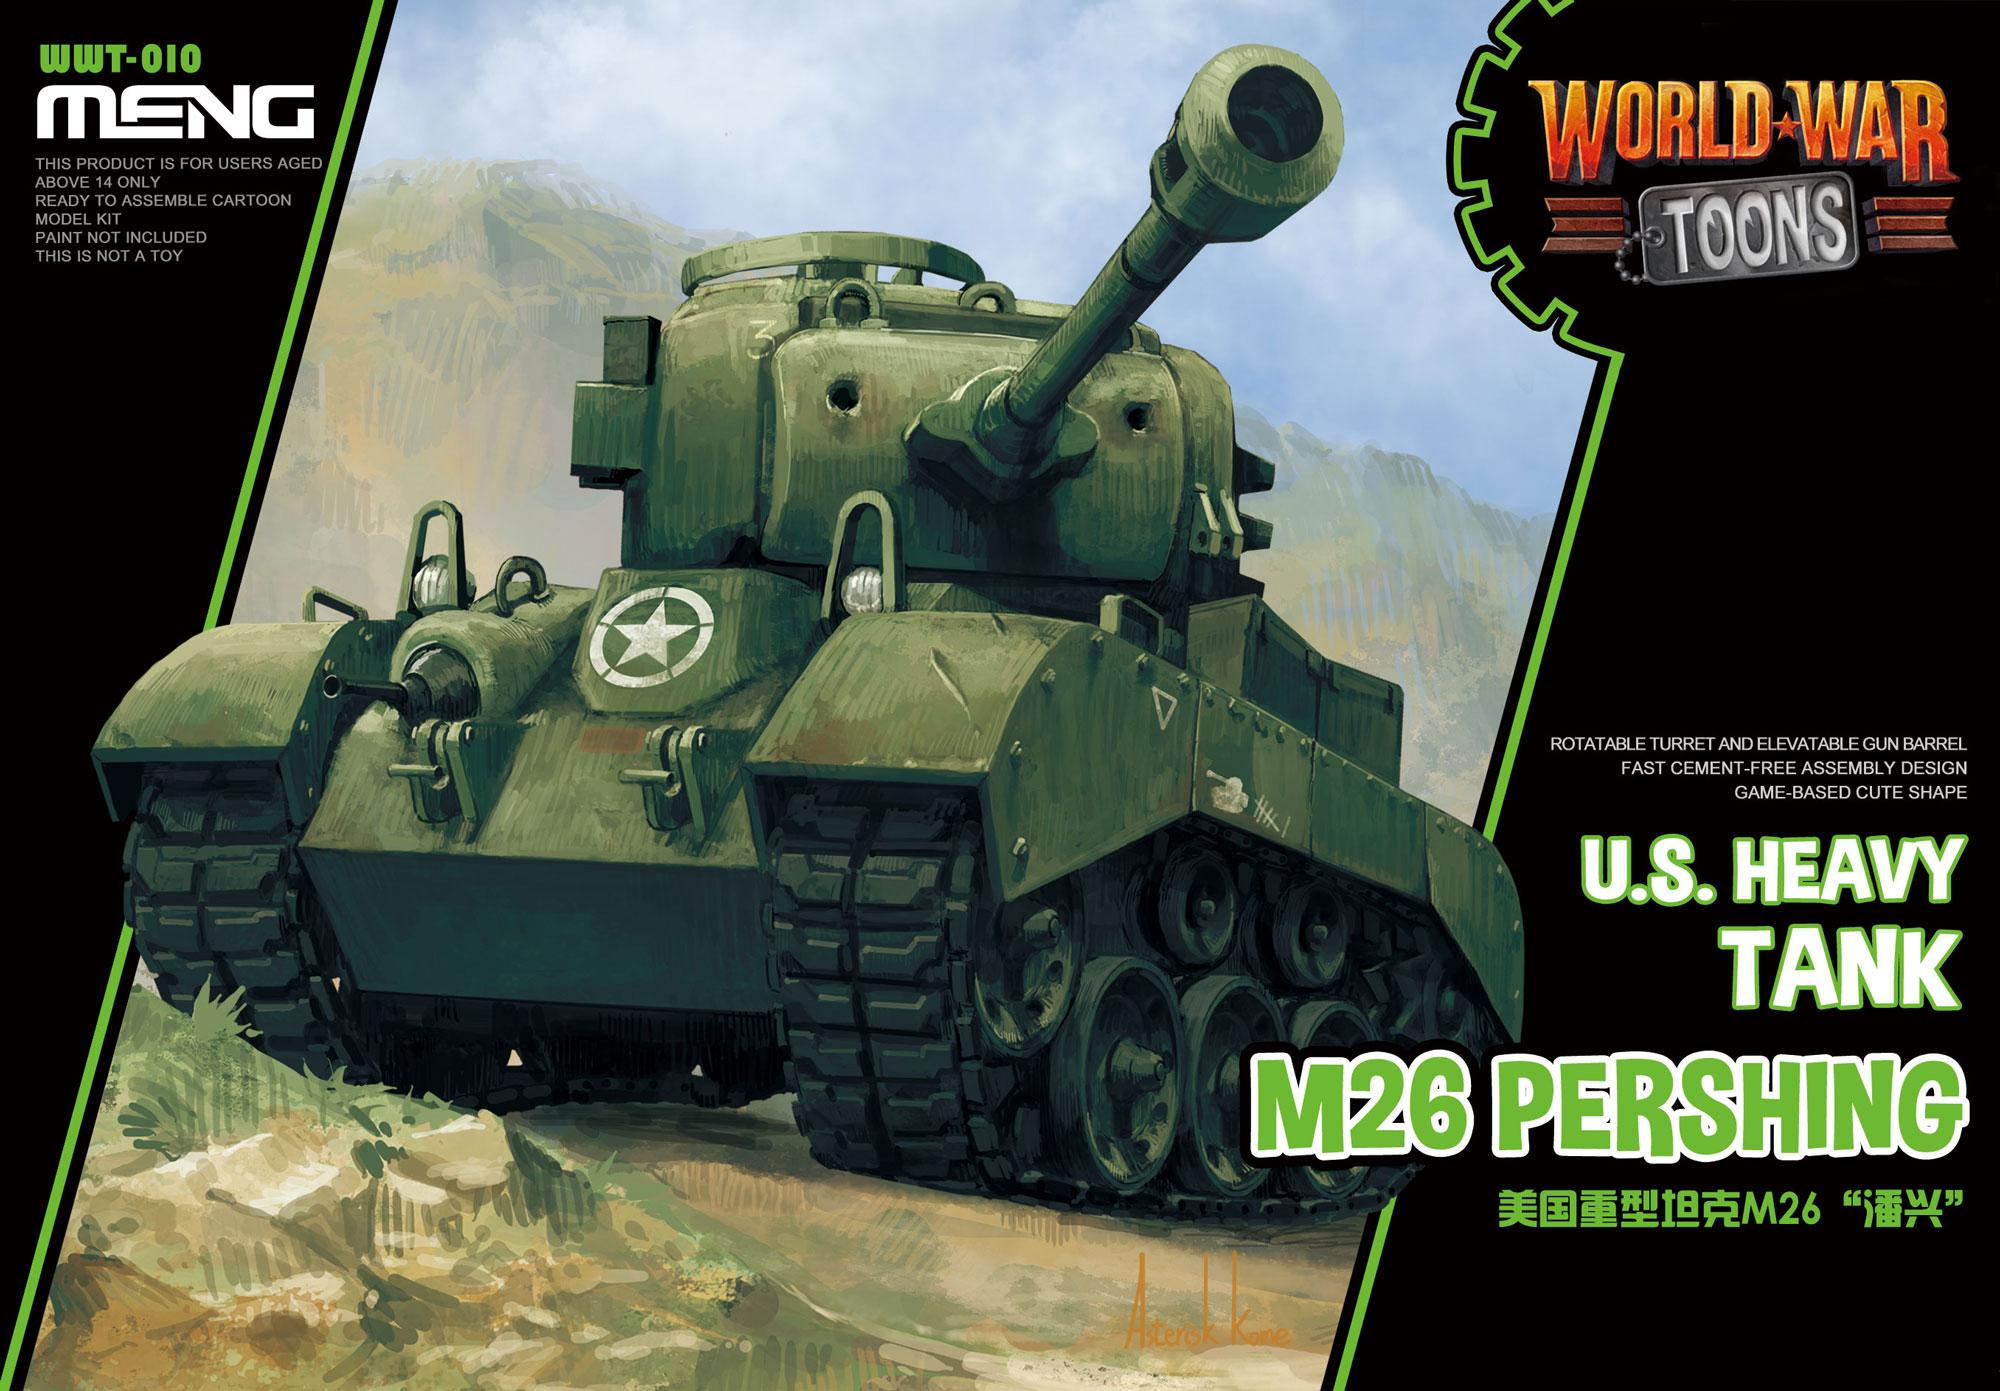 Meng U.S. Heavy Tank M26 Pershing